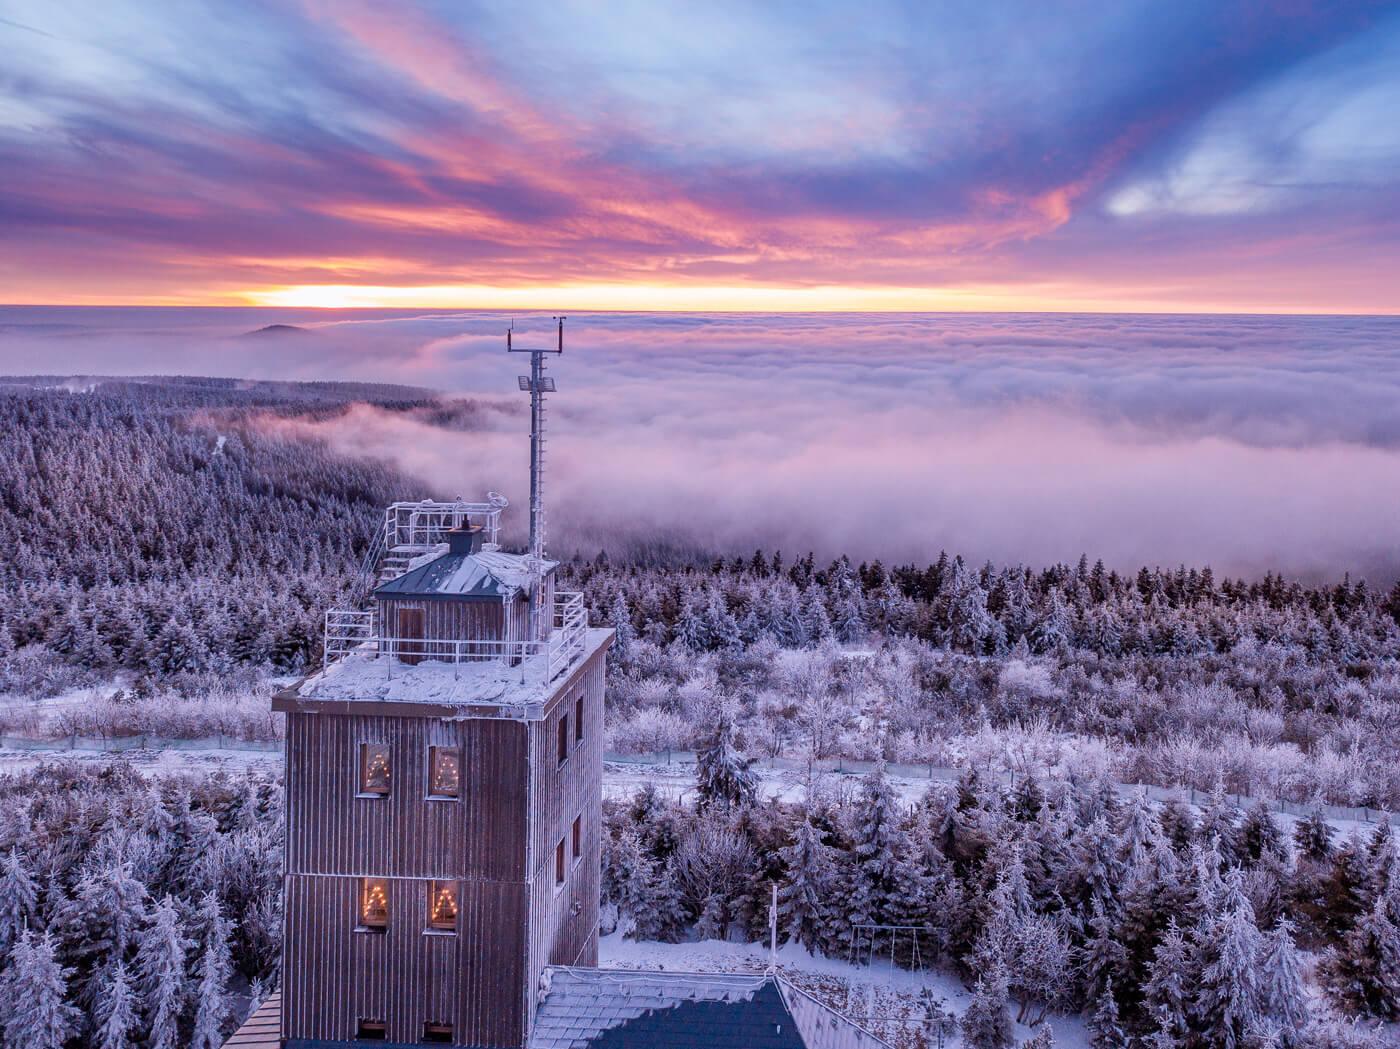 Fichtelberg-Sonnenuntergang-Drone-Fichtelberg.jpg